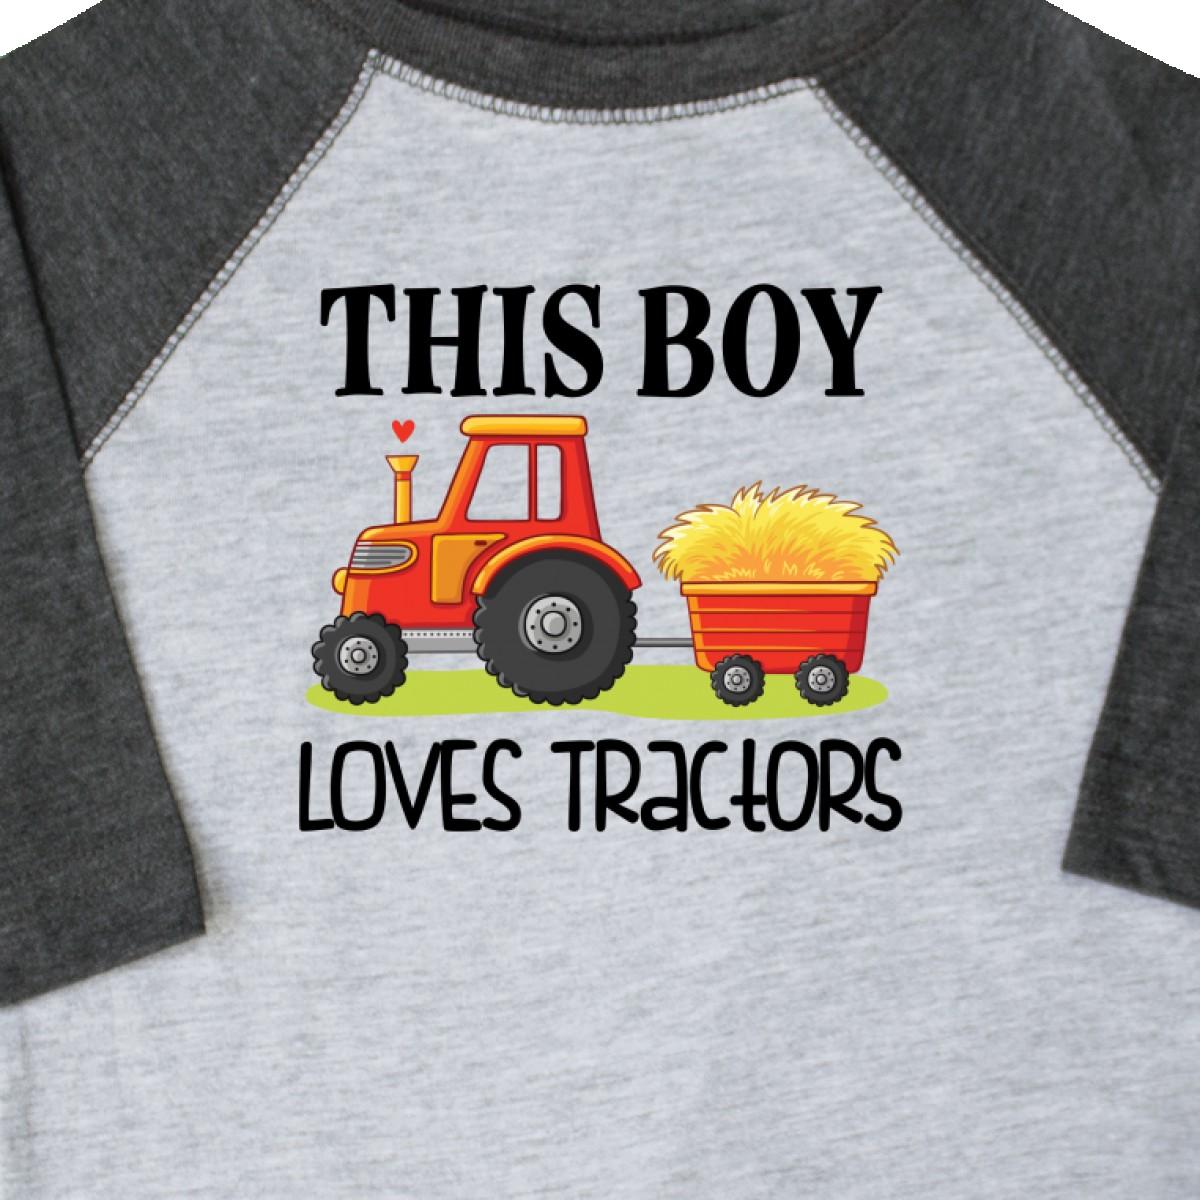 Inktastic-Farming-Cute-Boy-Loves-Tractors-Toddler-T-Shirt-Farm-Childs-Toys-Kids thumbnail 4